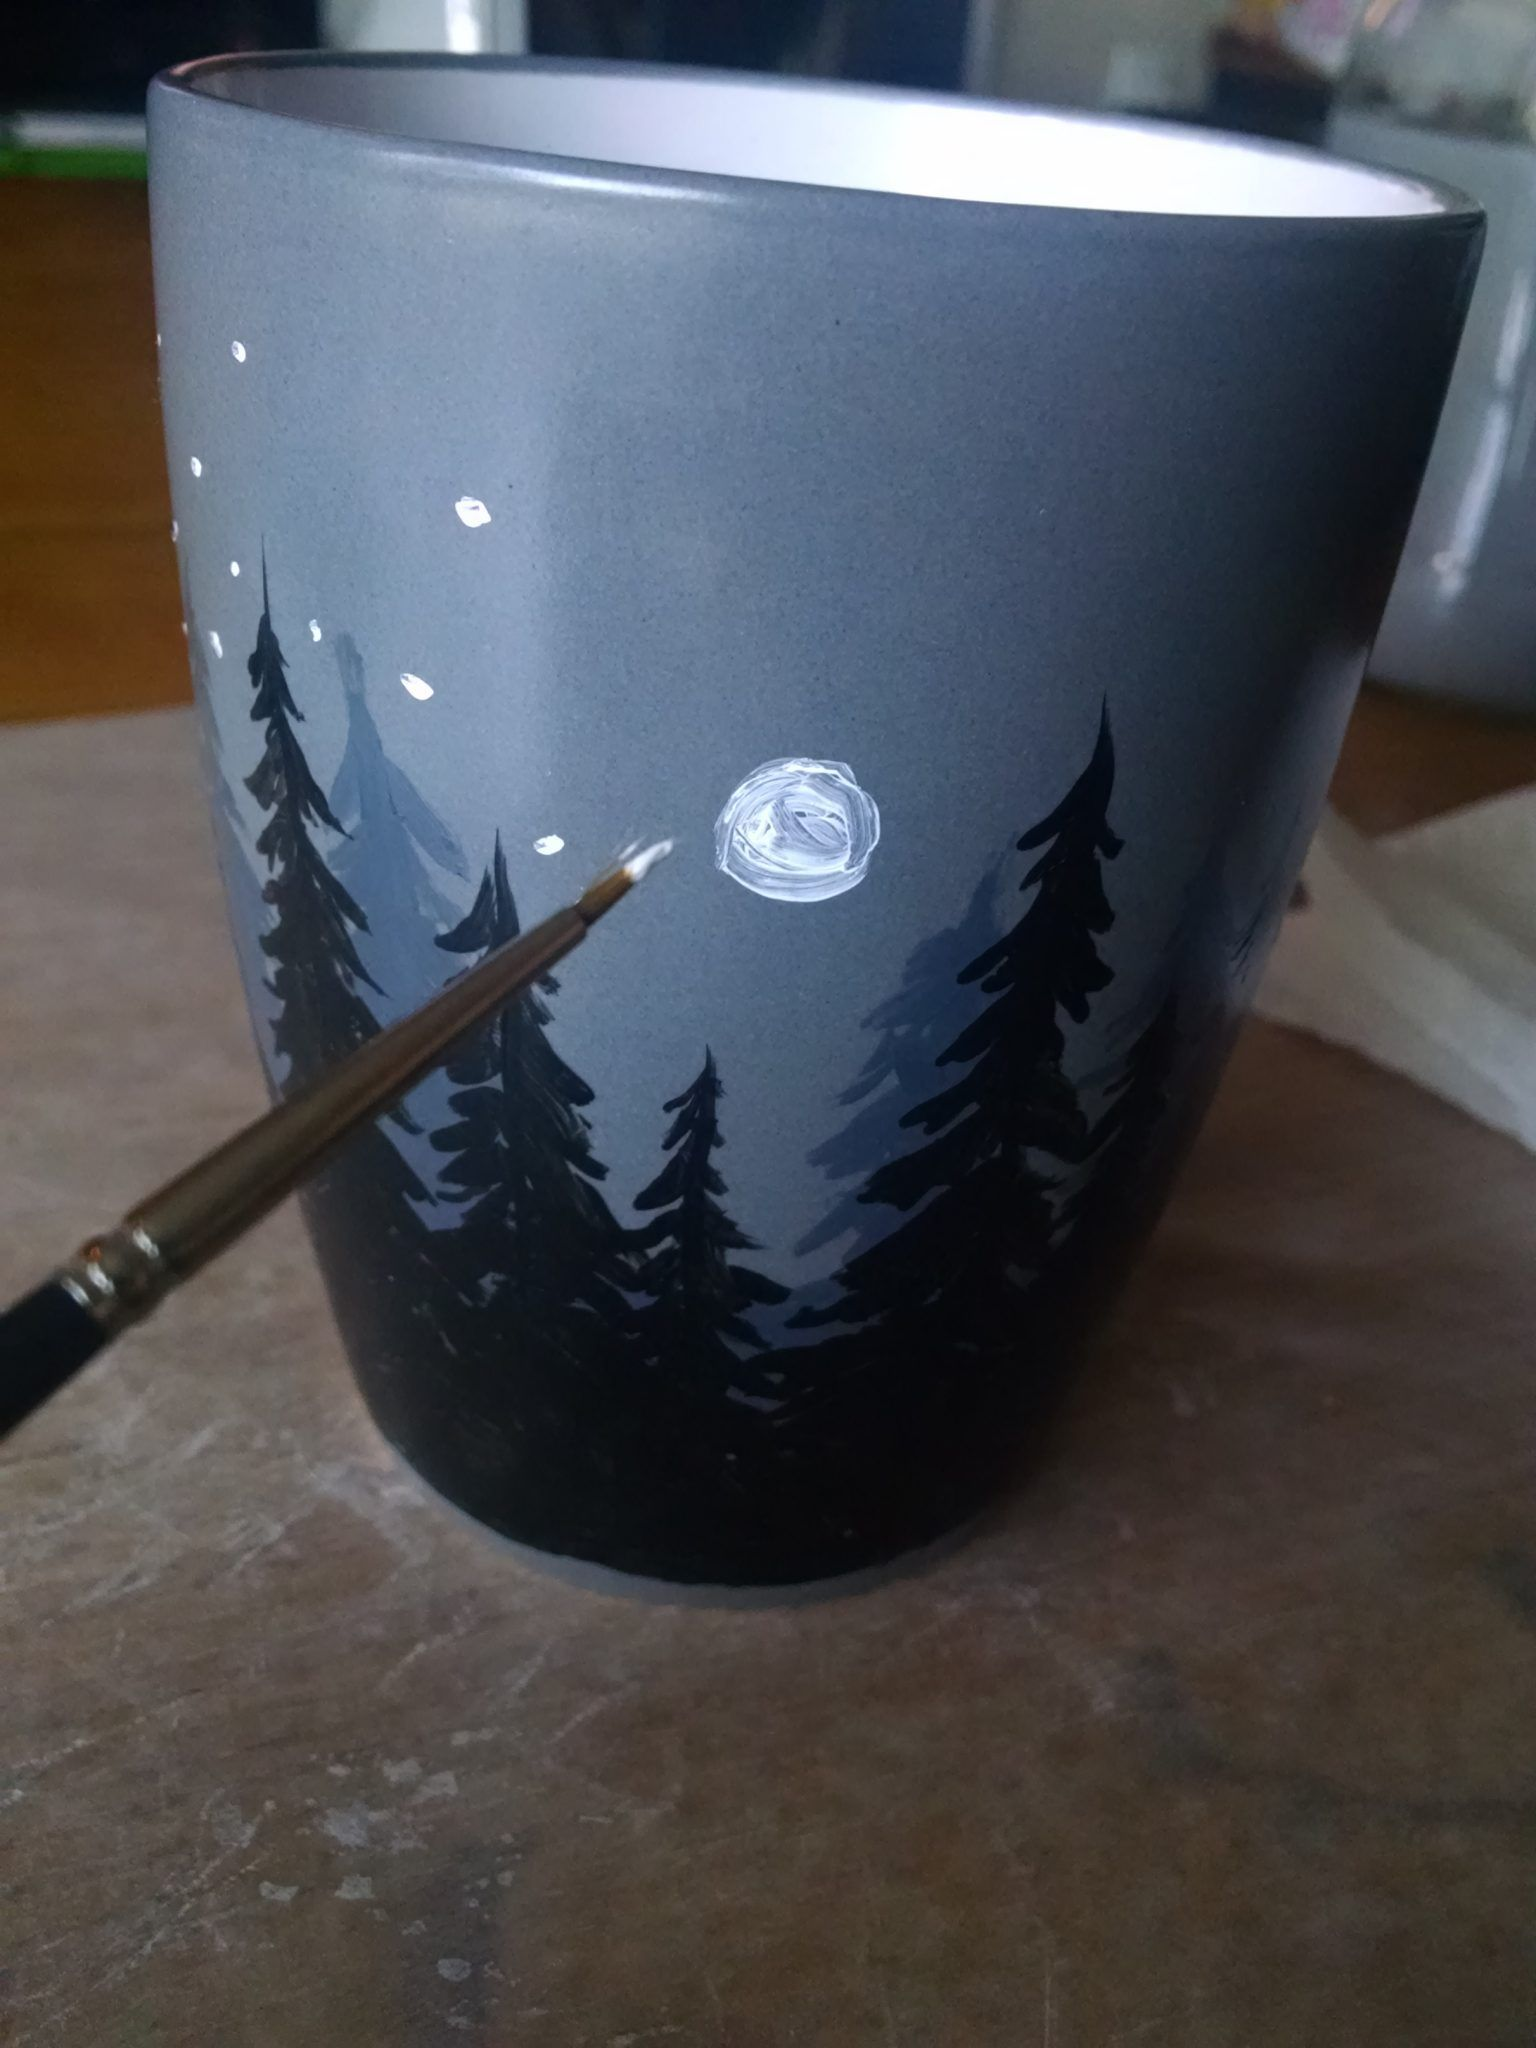 Diy Ceramic Mug Painting Tutorial Dark Forest 8211 Diy Ceramic In 2020 Diy Ceramic Painted Pots Diy Pottery Painting Designs